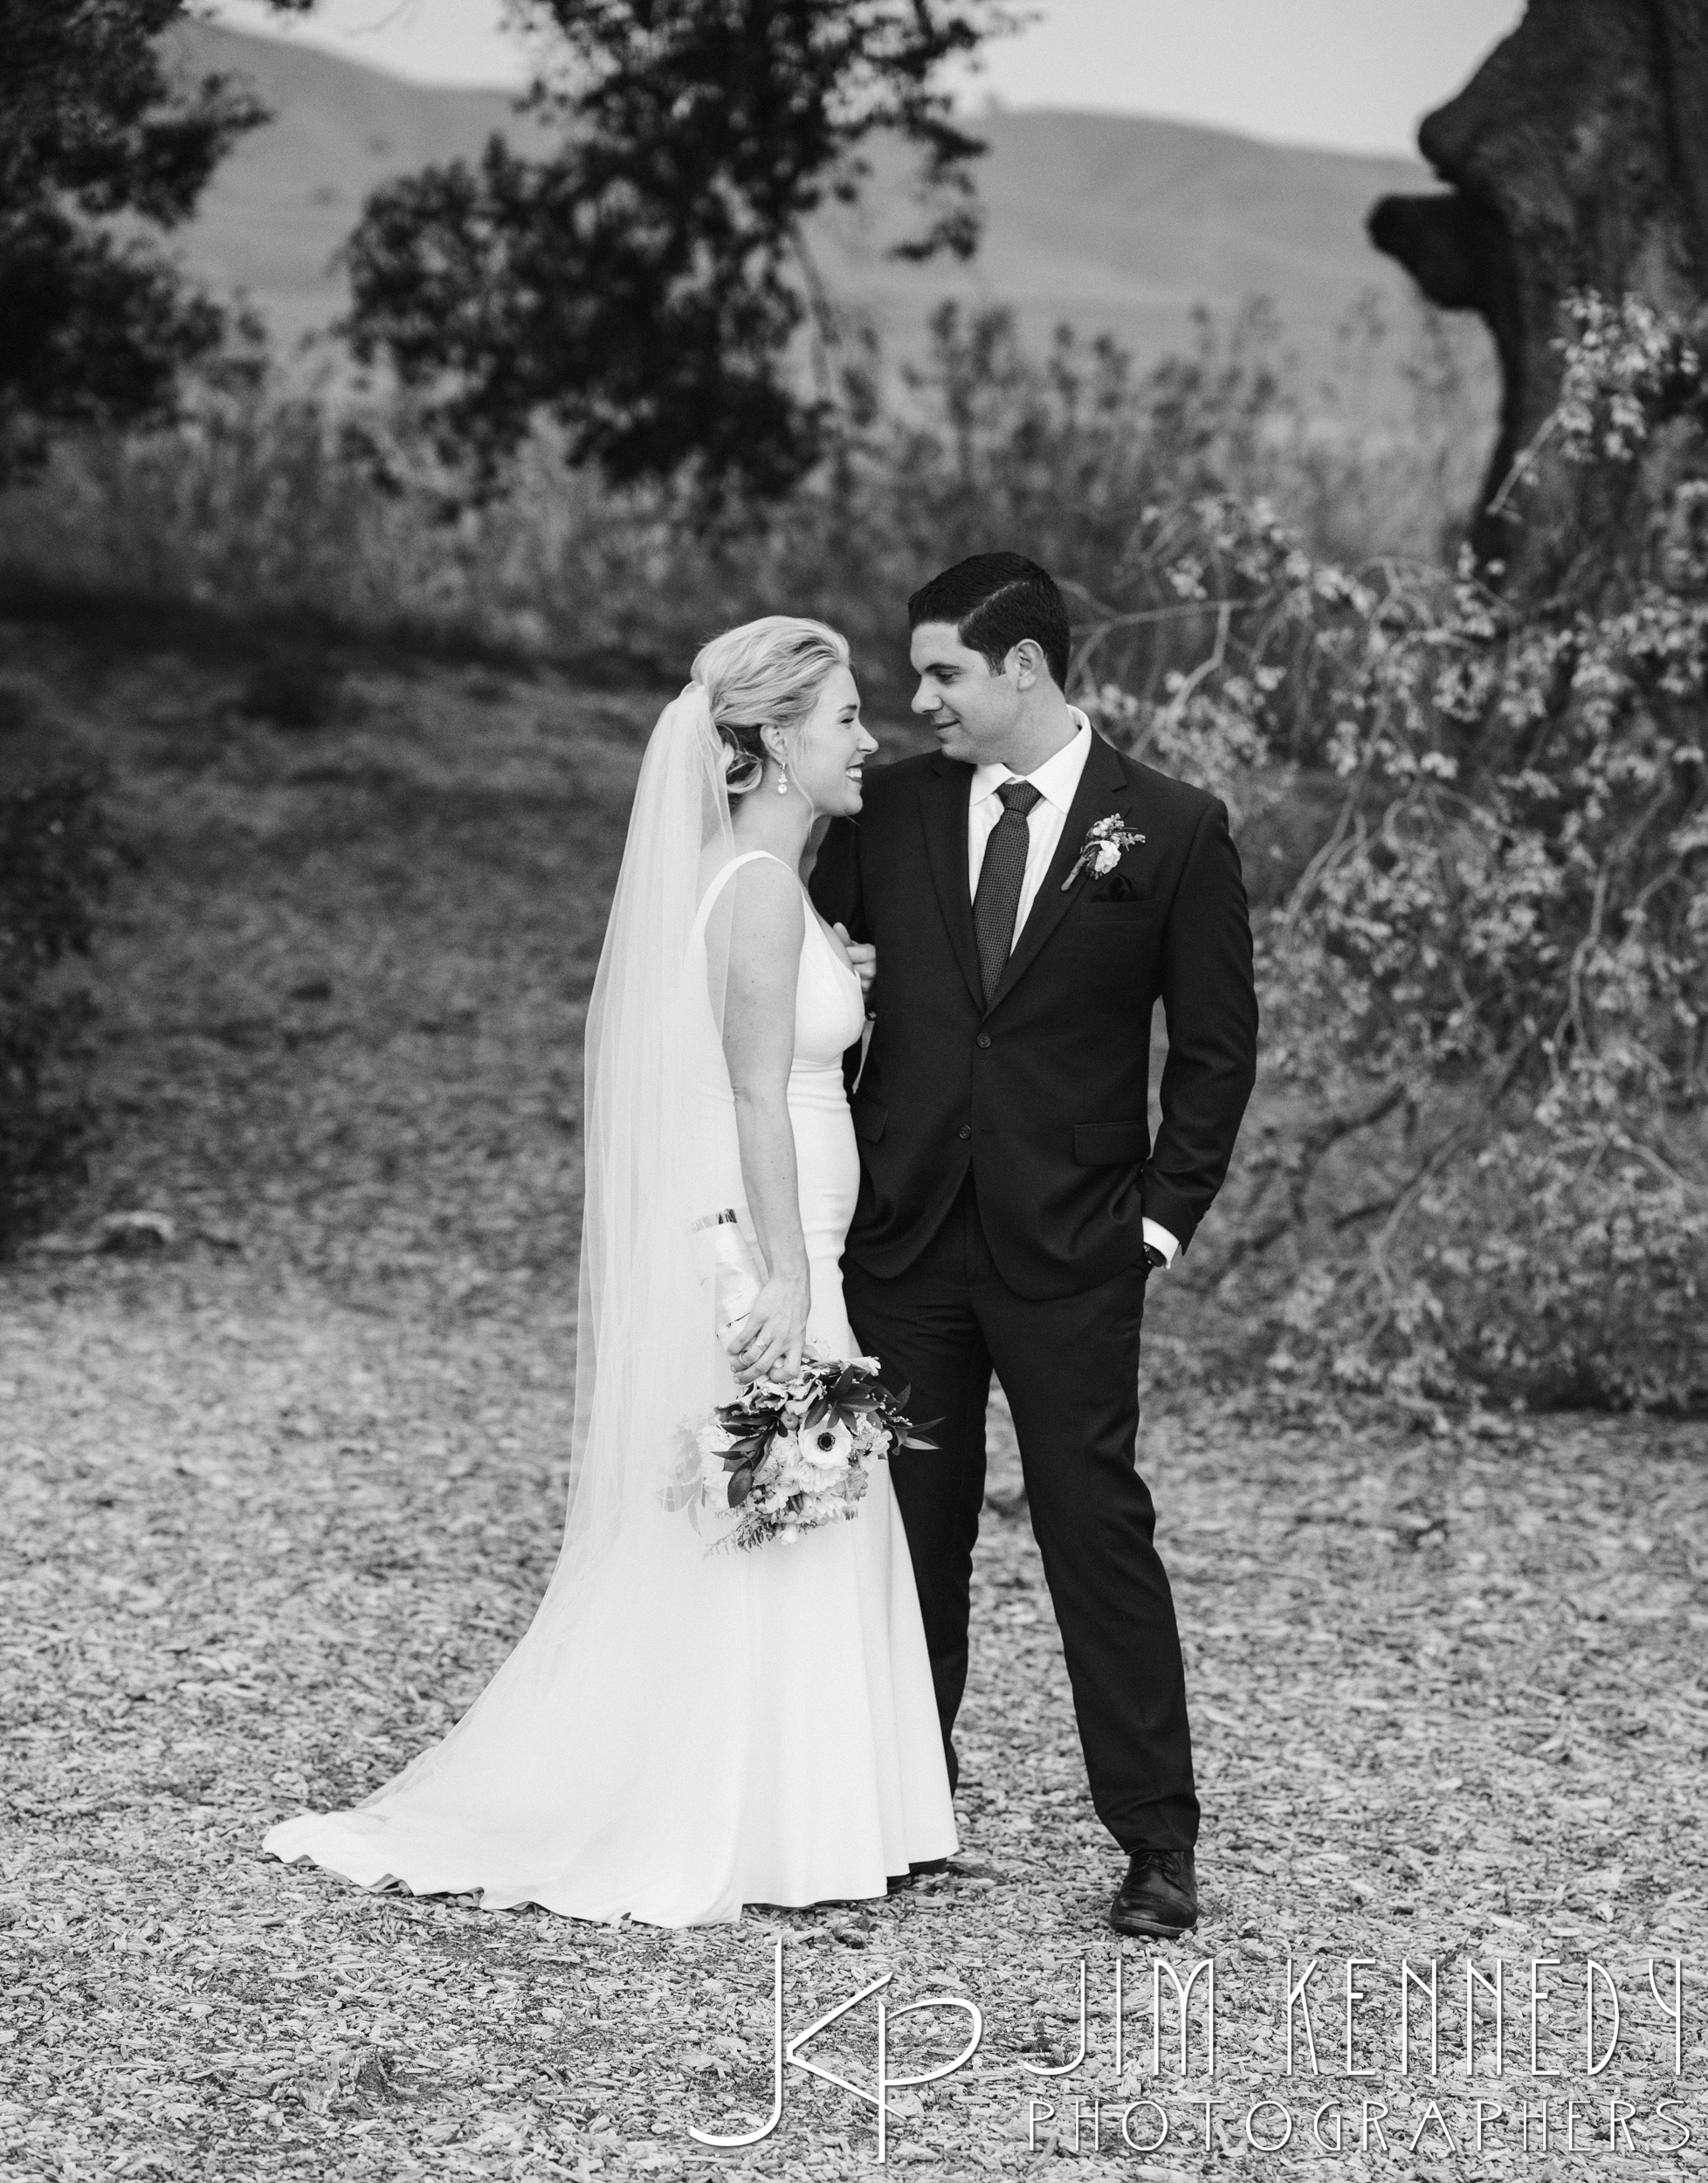 jim_kennedy_photographers_highland_springs_wedding_caitlyn_0150.jpg